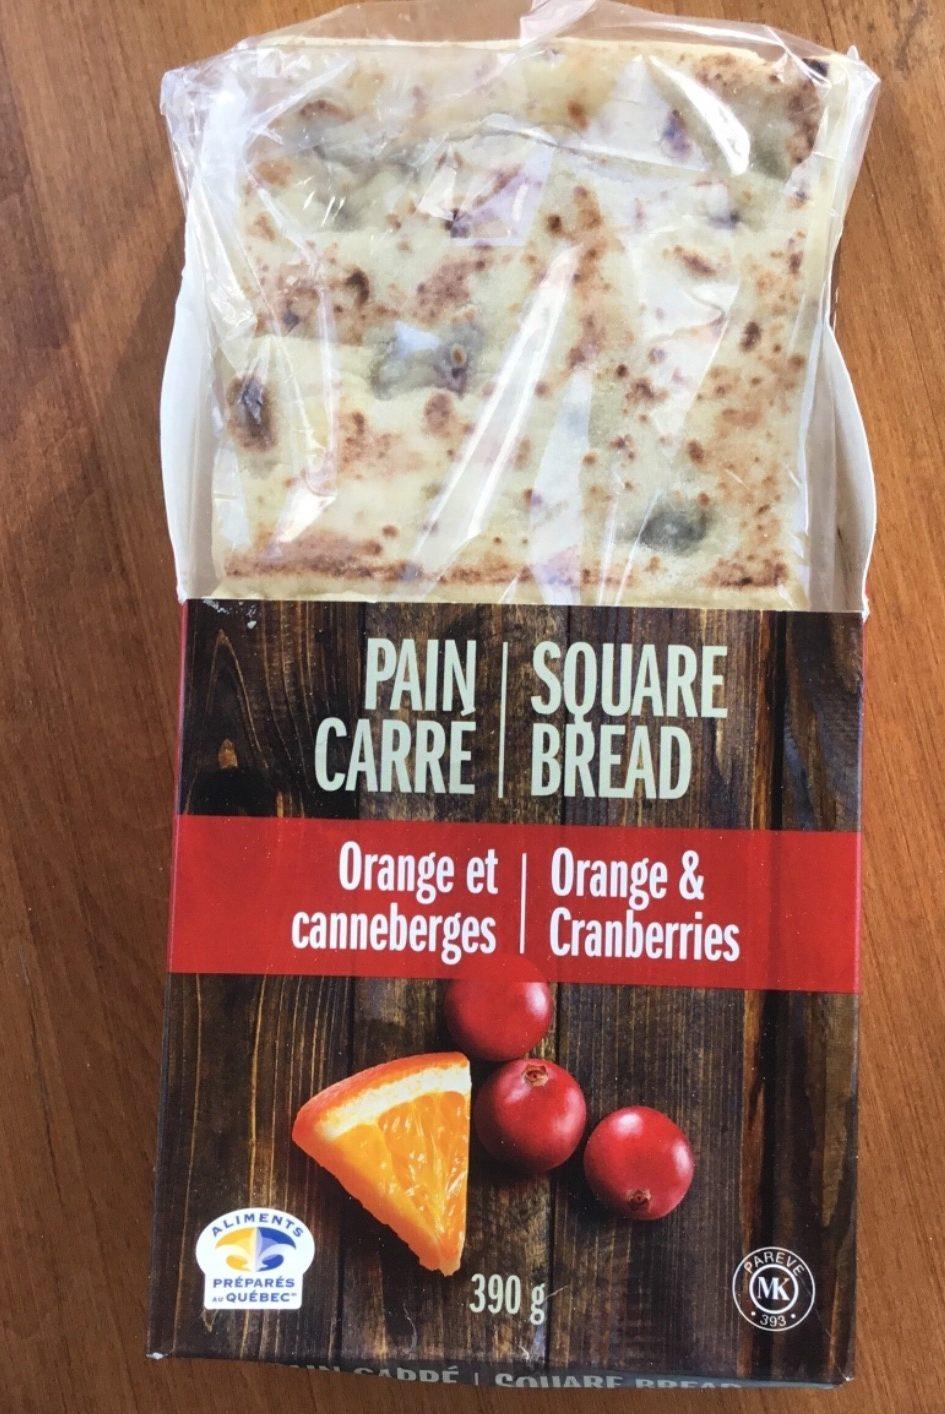 Pain carré - Product - fr